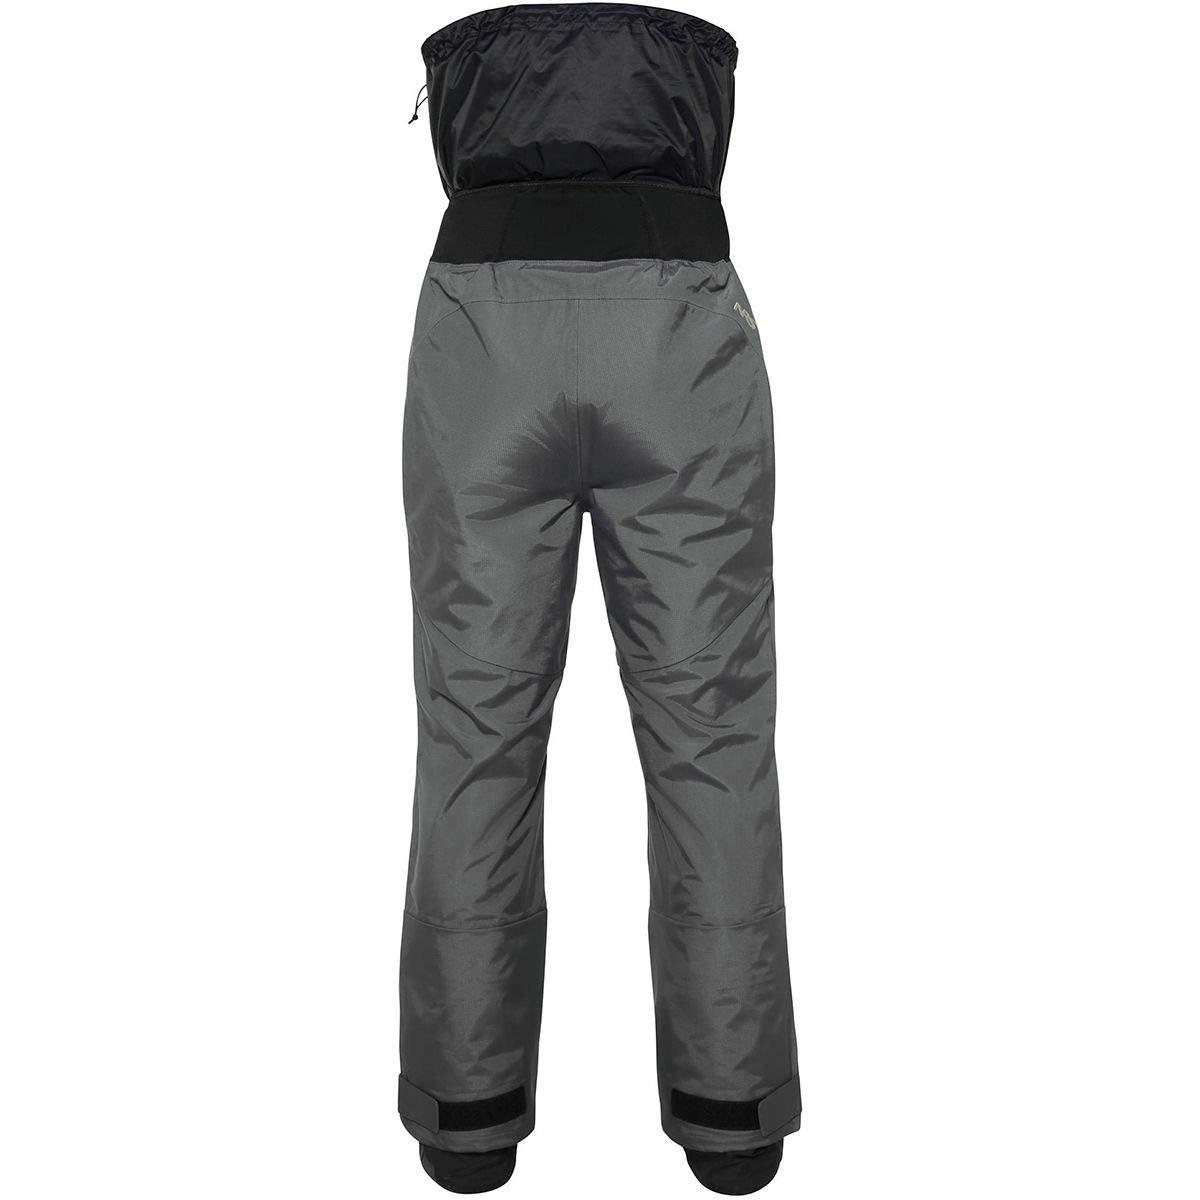 NRS Freefall Dry Pant Gunmetal Large